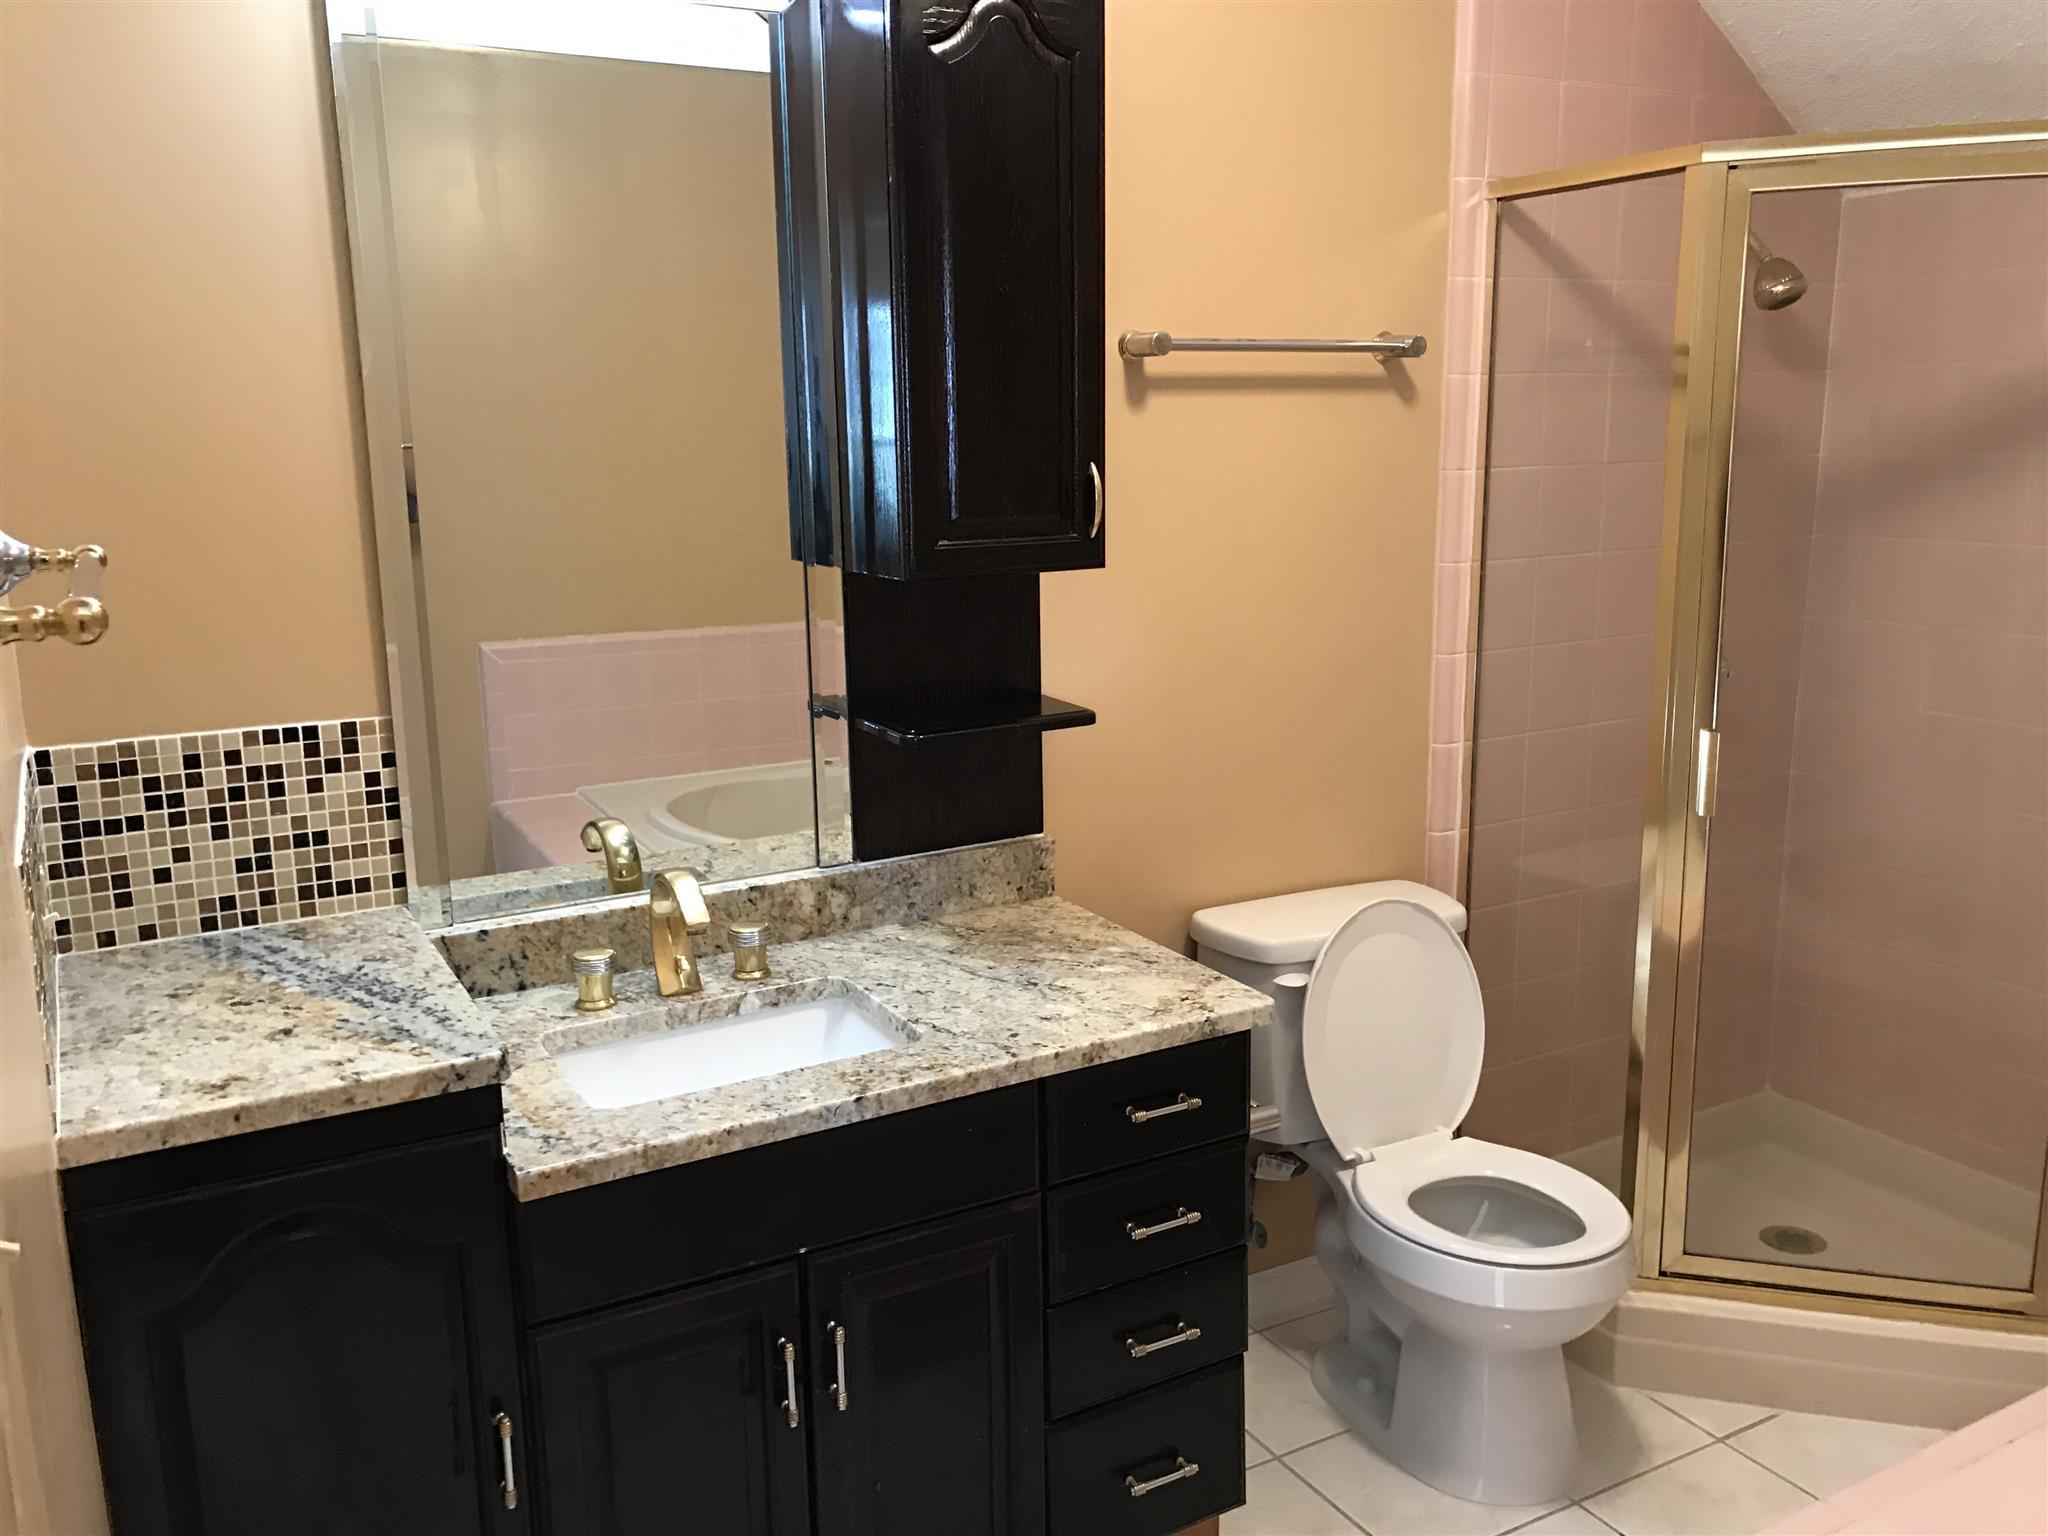 Bathroom Sinks Nashville Tn 1104 crestfield dr, nashville, tn 37211 mls# 1800635 - movoto